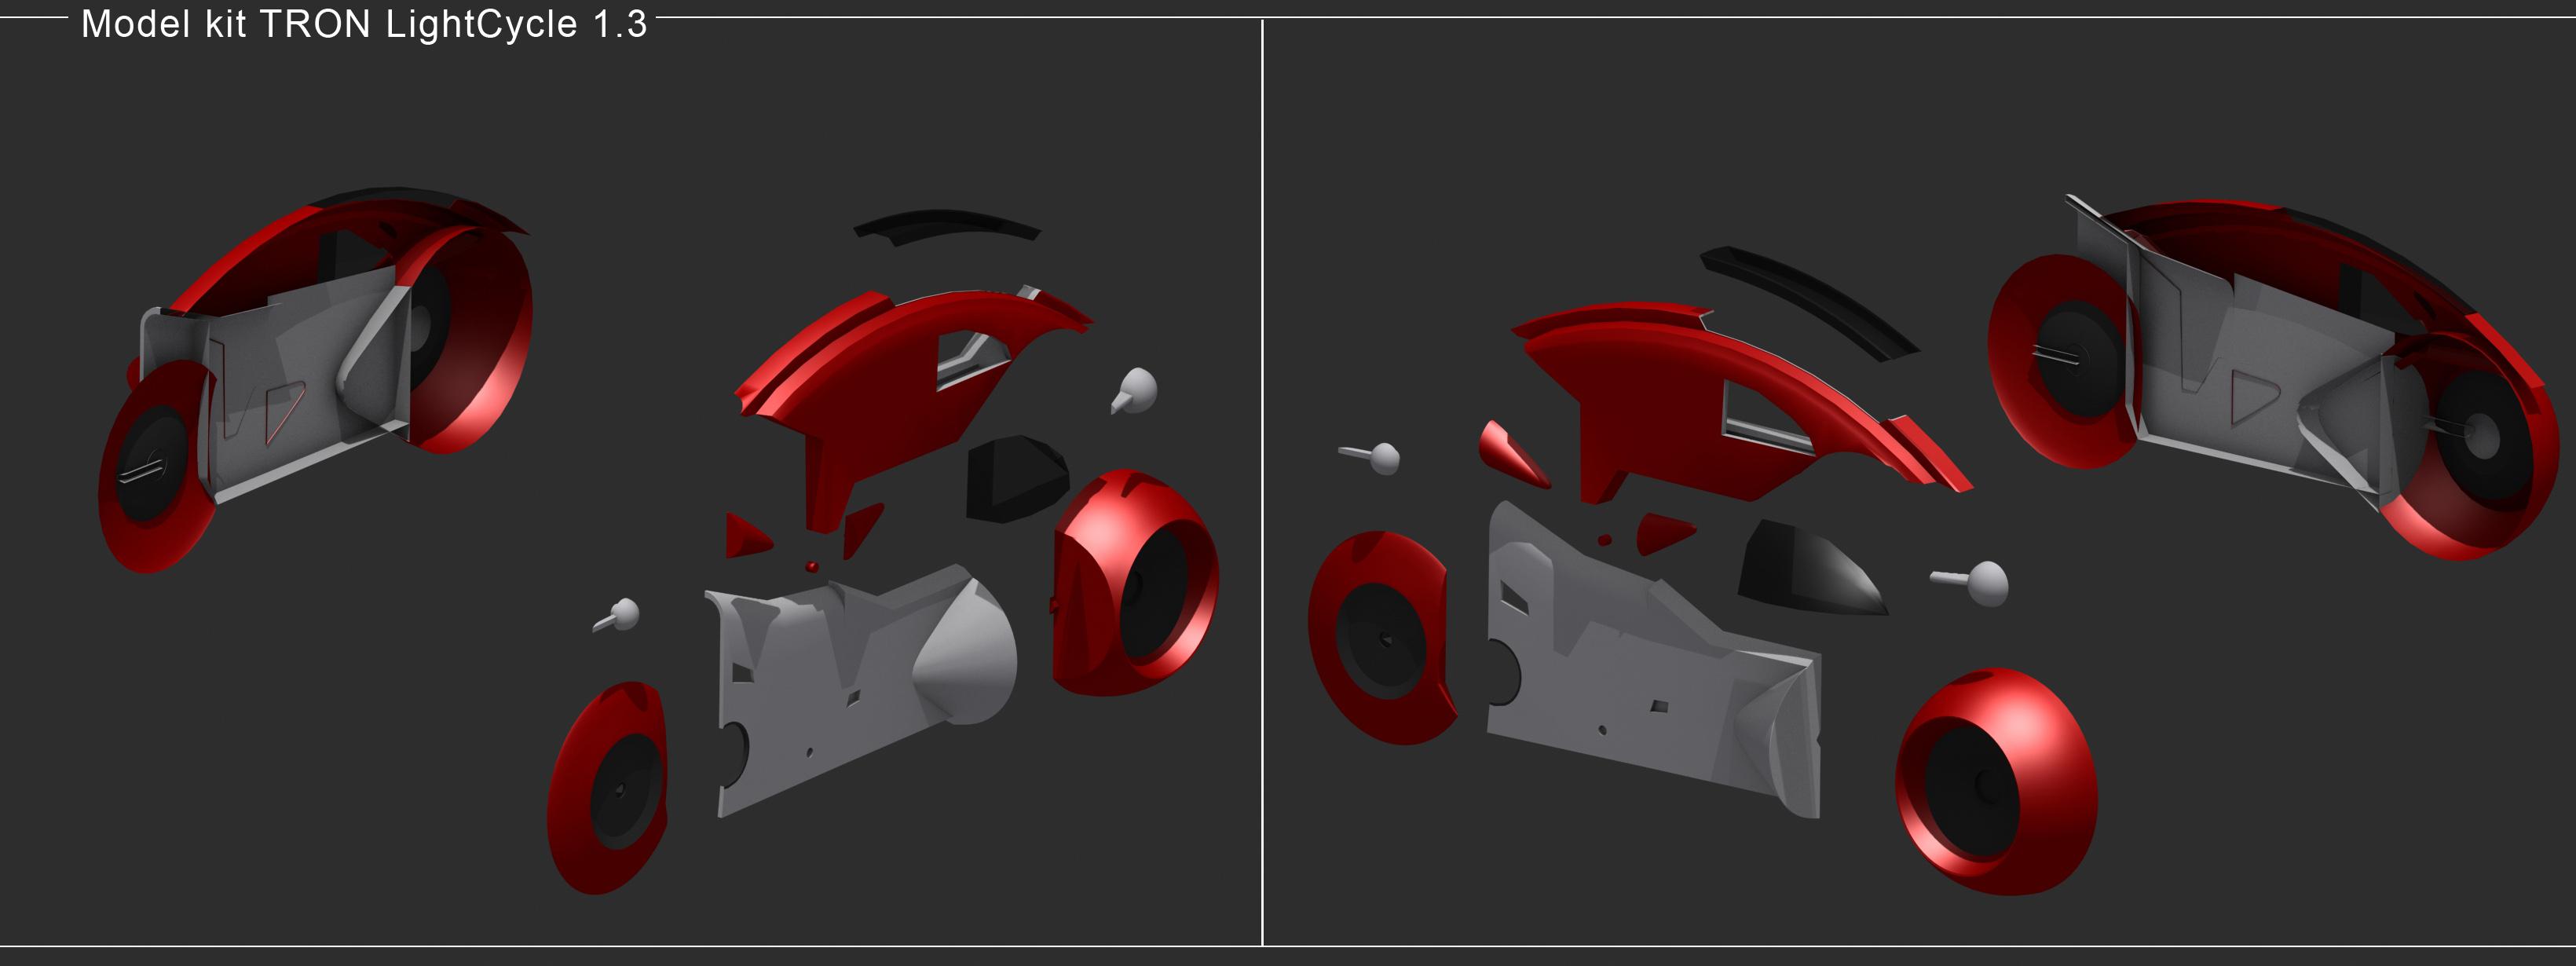 < model kit > TRON 1 LightCycle Render02